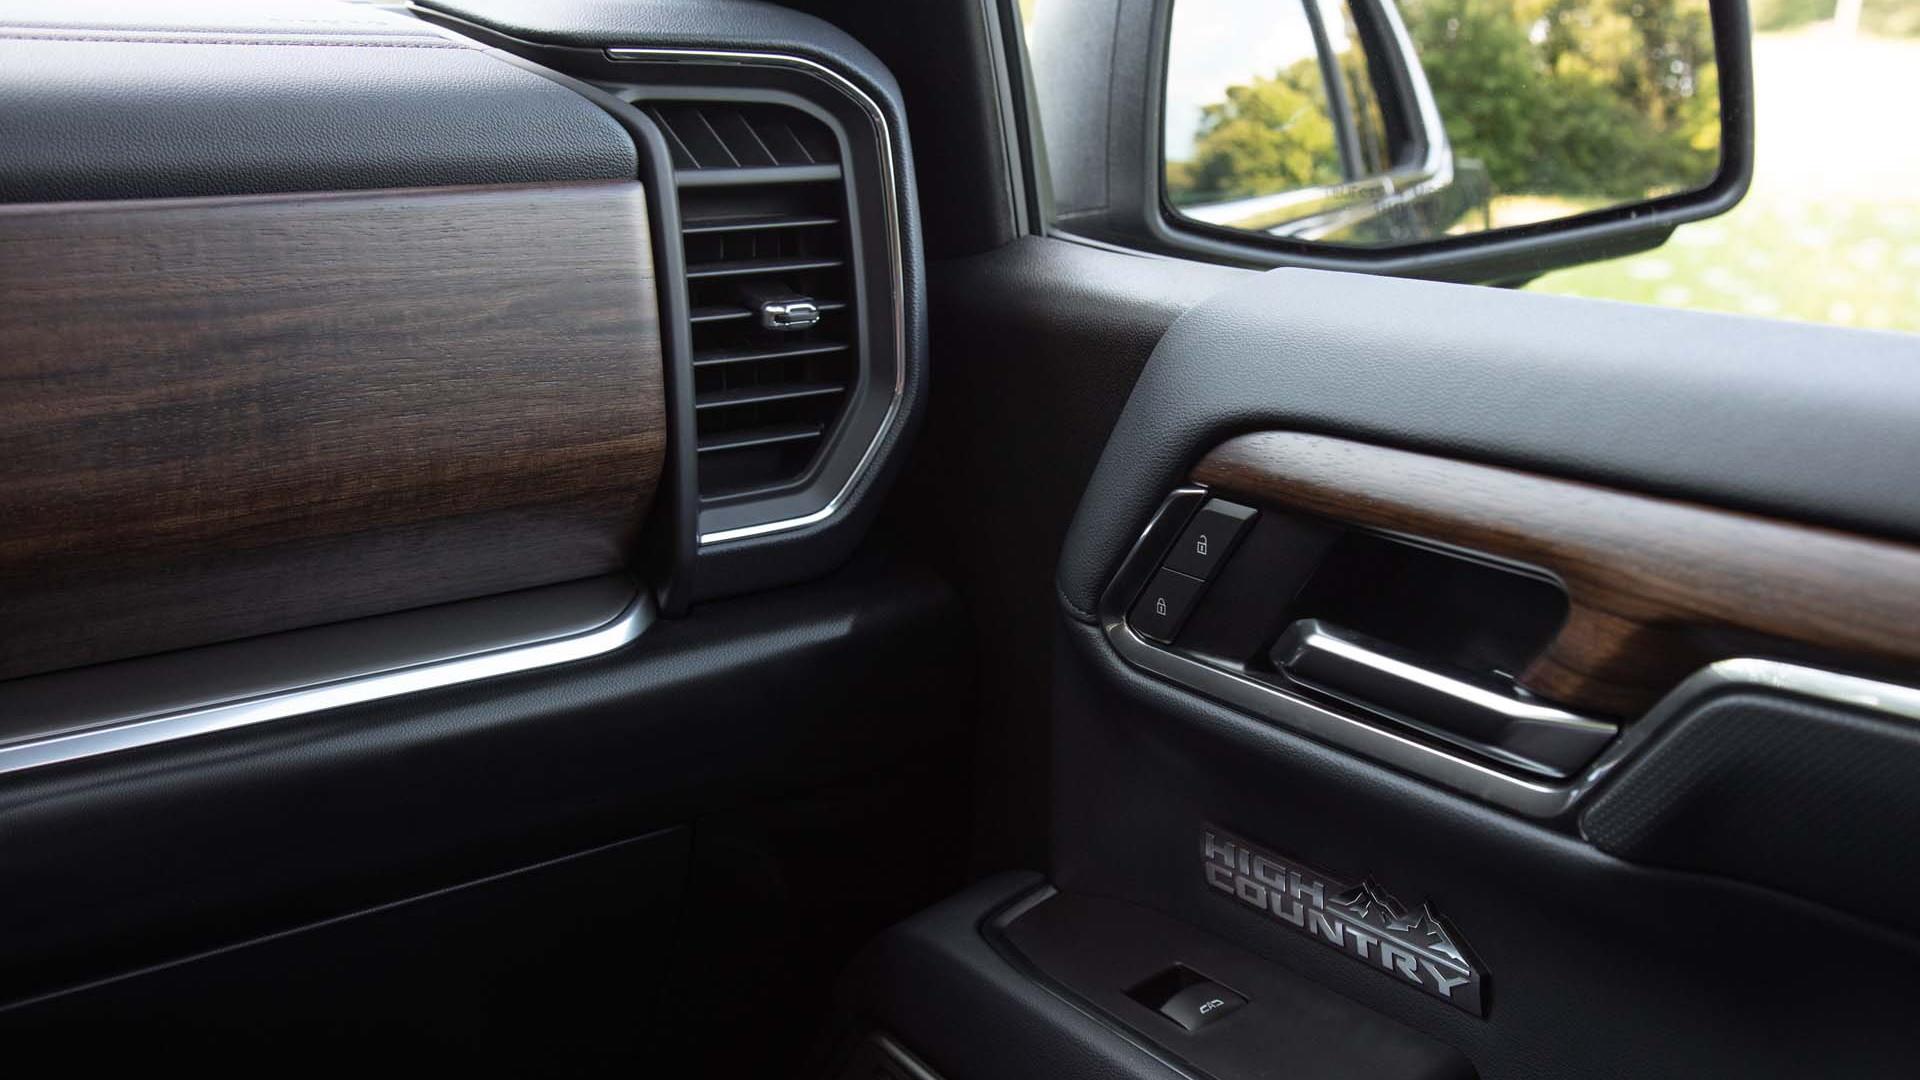 2022 Chevrolet Silverado 1500 High Country